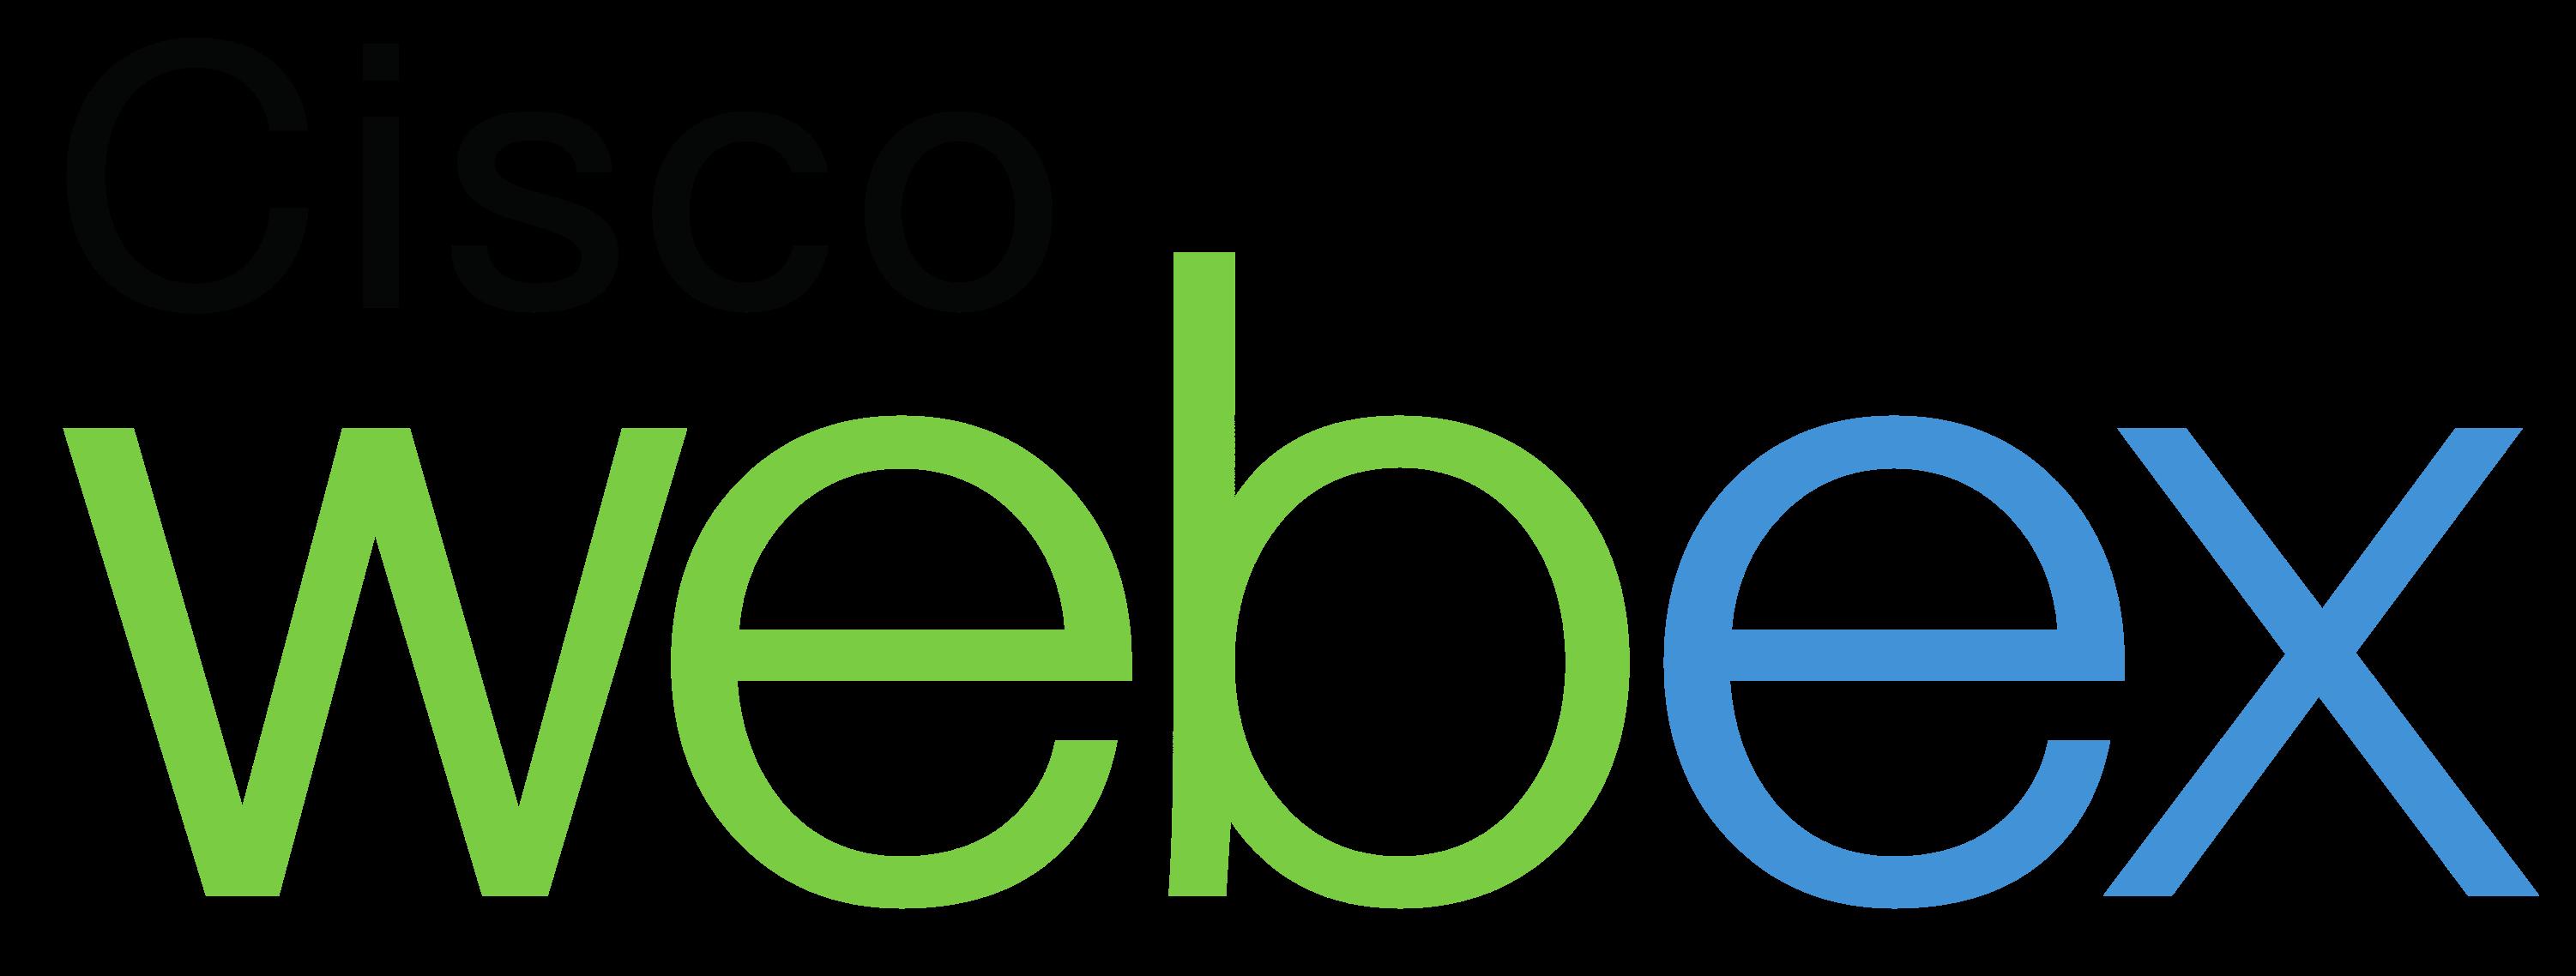 Cisco_Webex_logo_wordmark